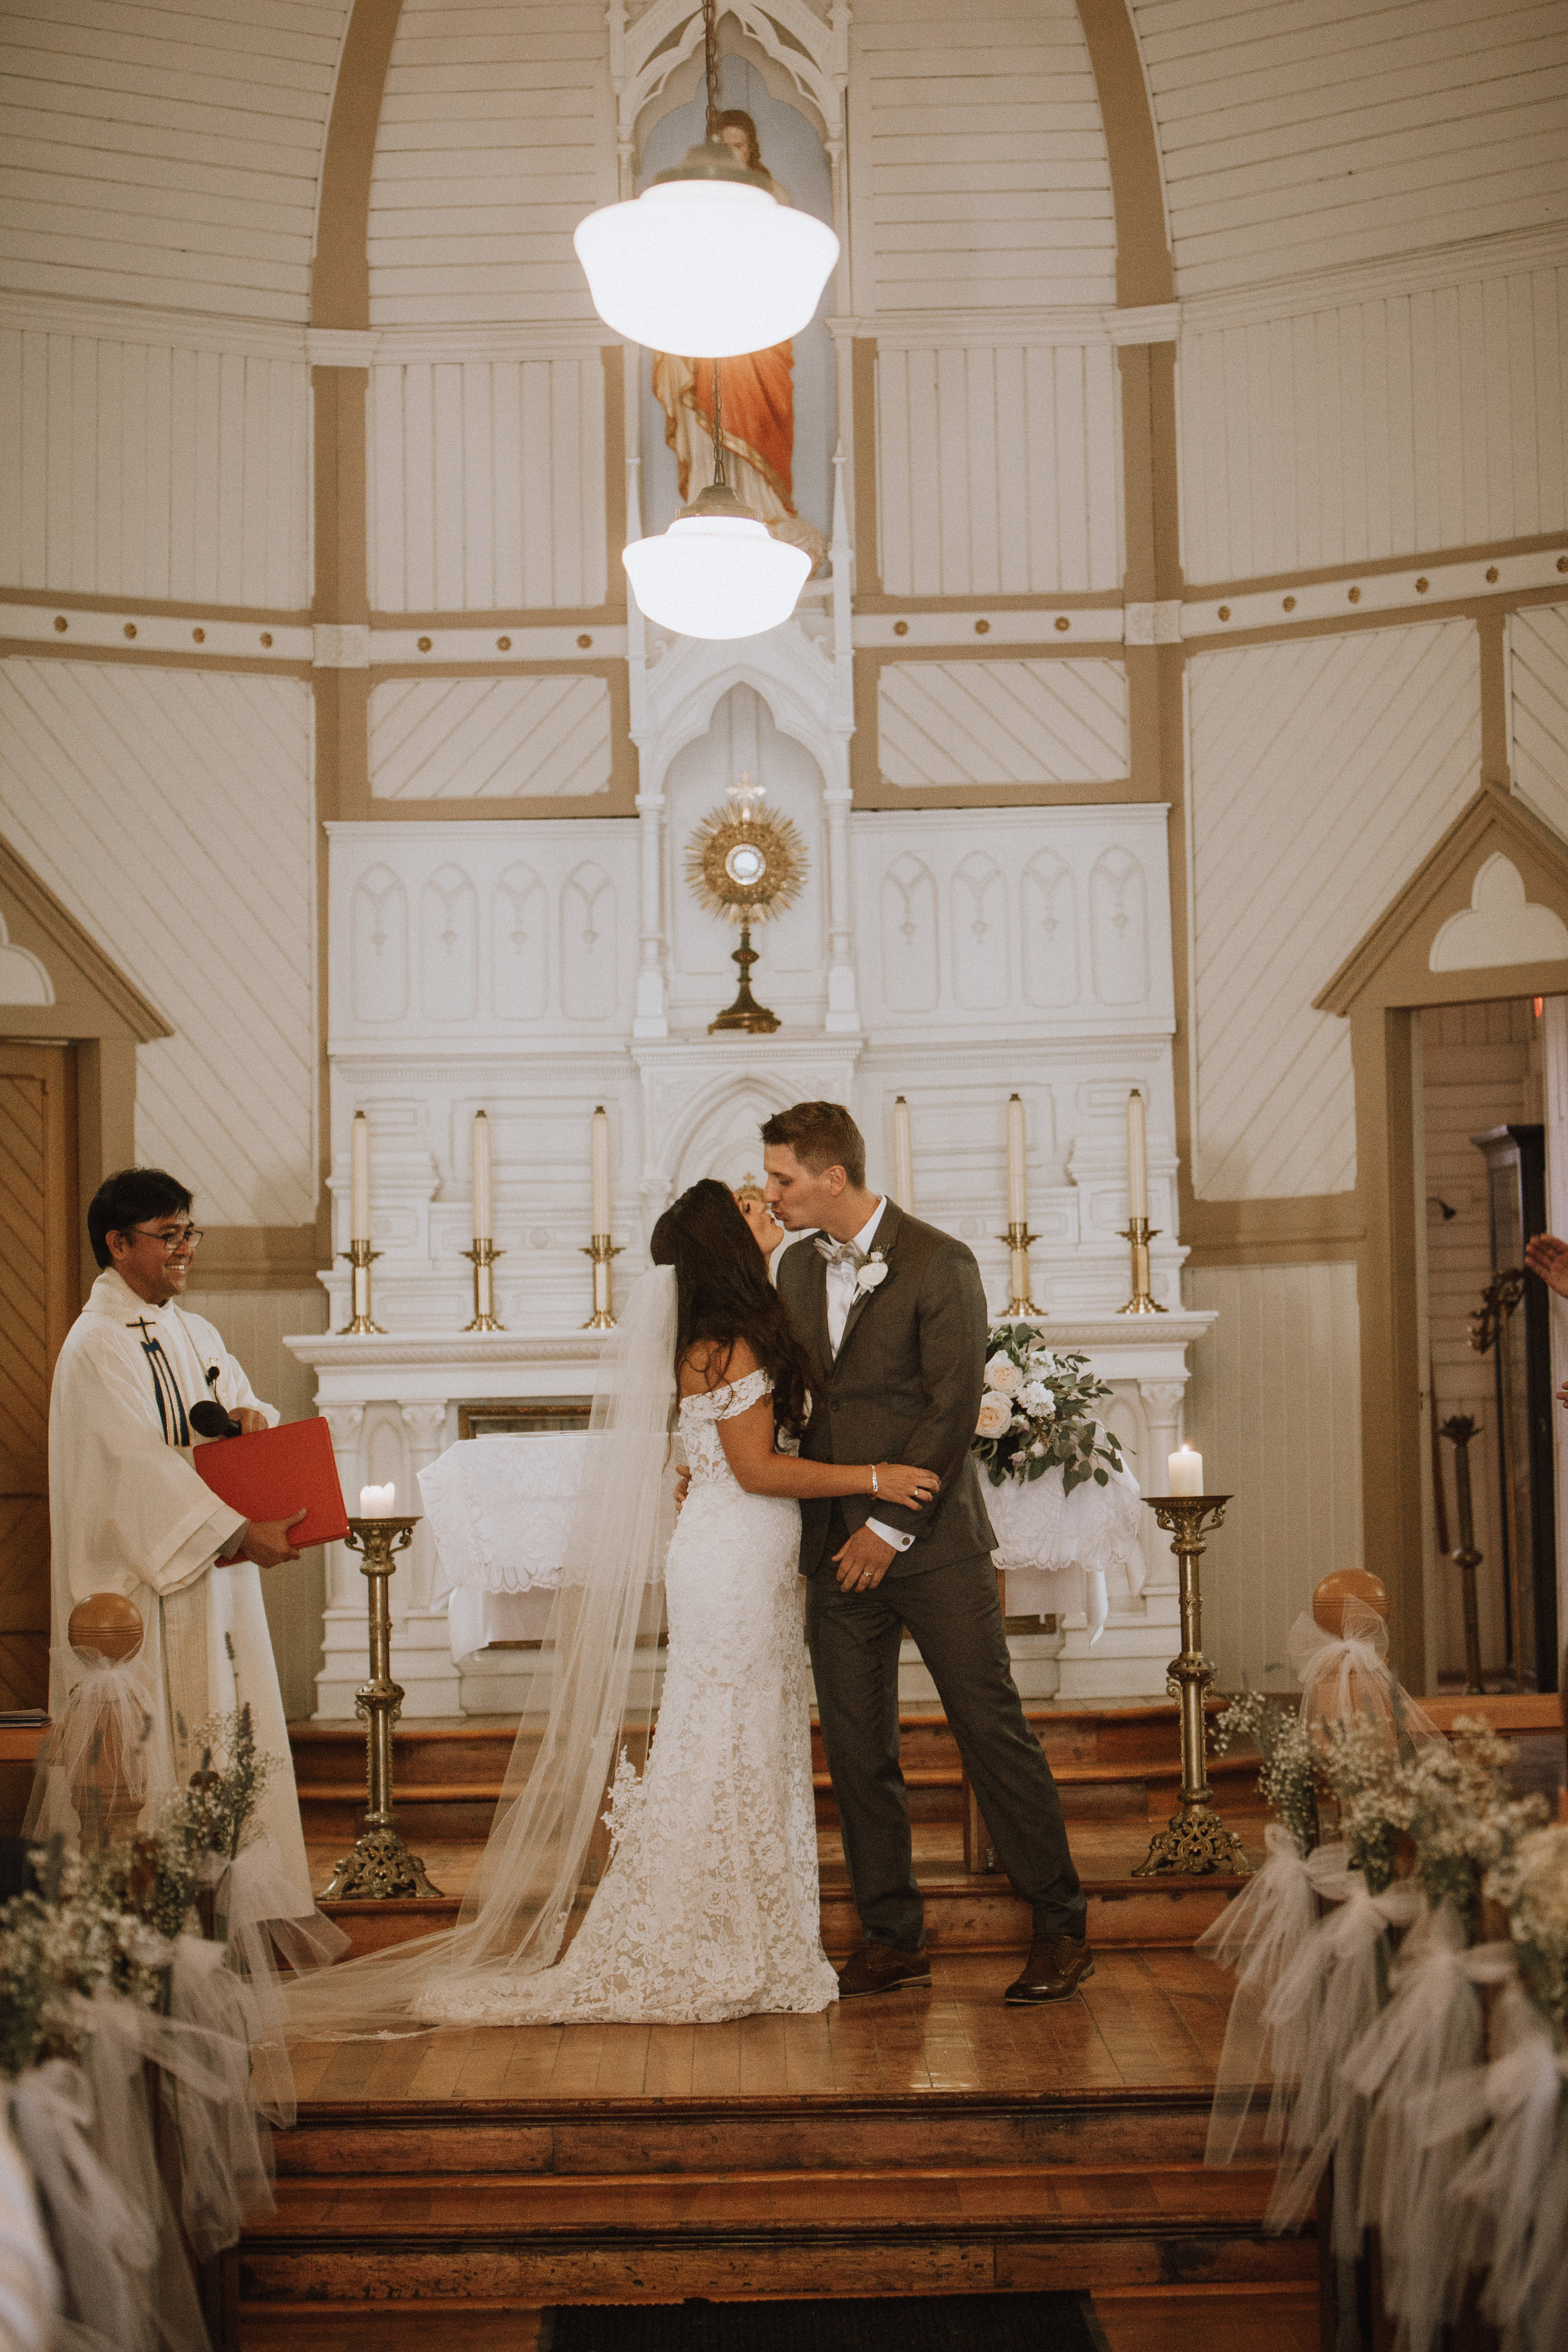 Kurt + Melissa 2 - Ceremony-142.jpg